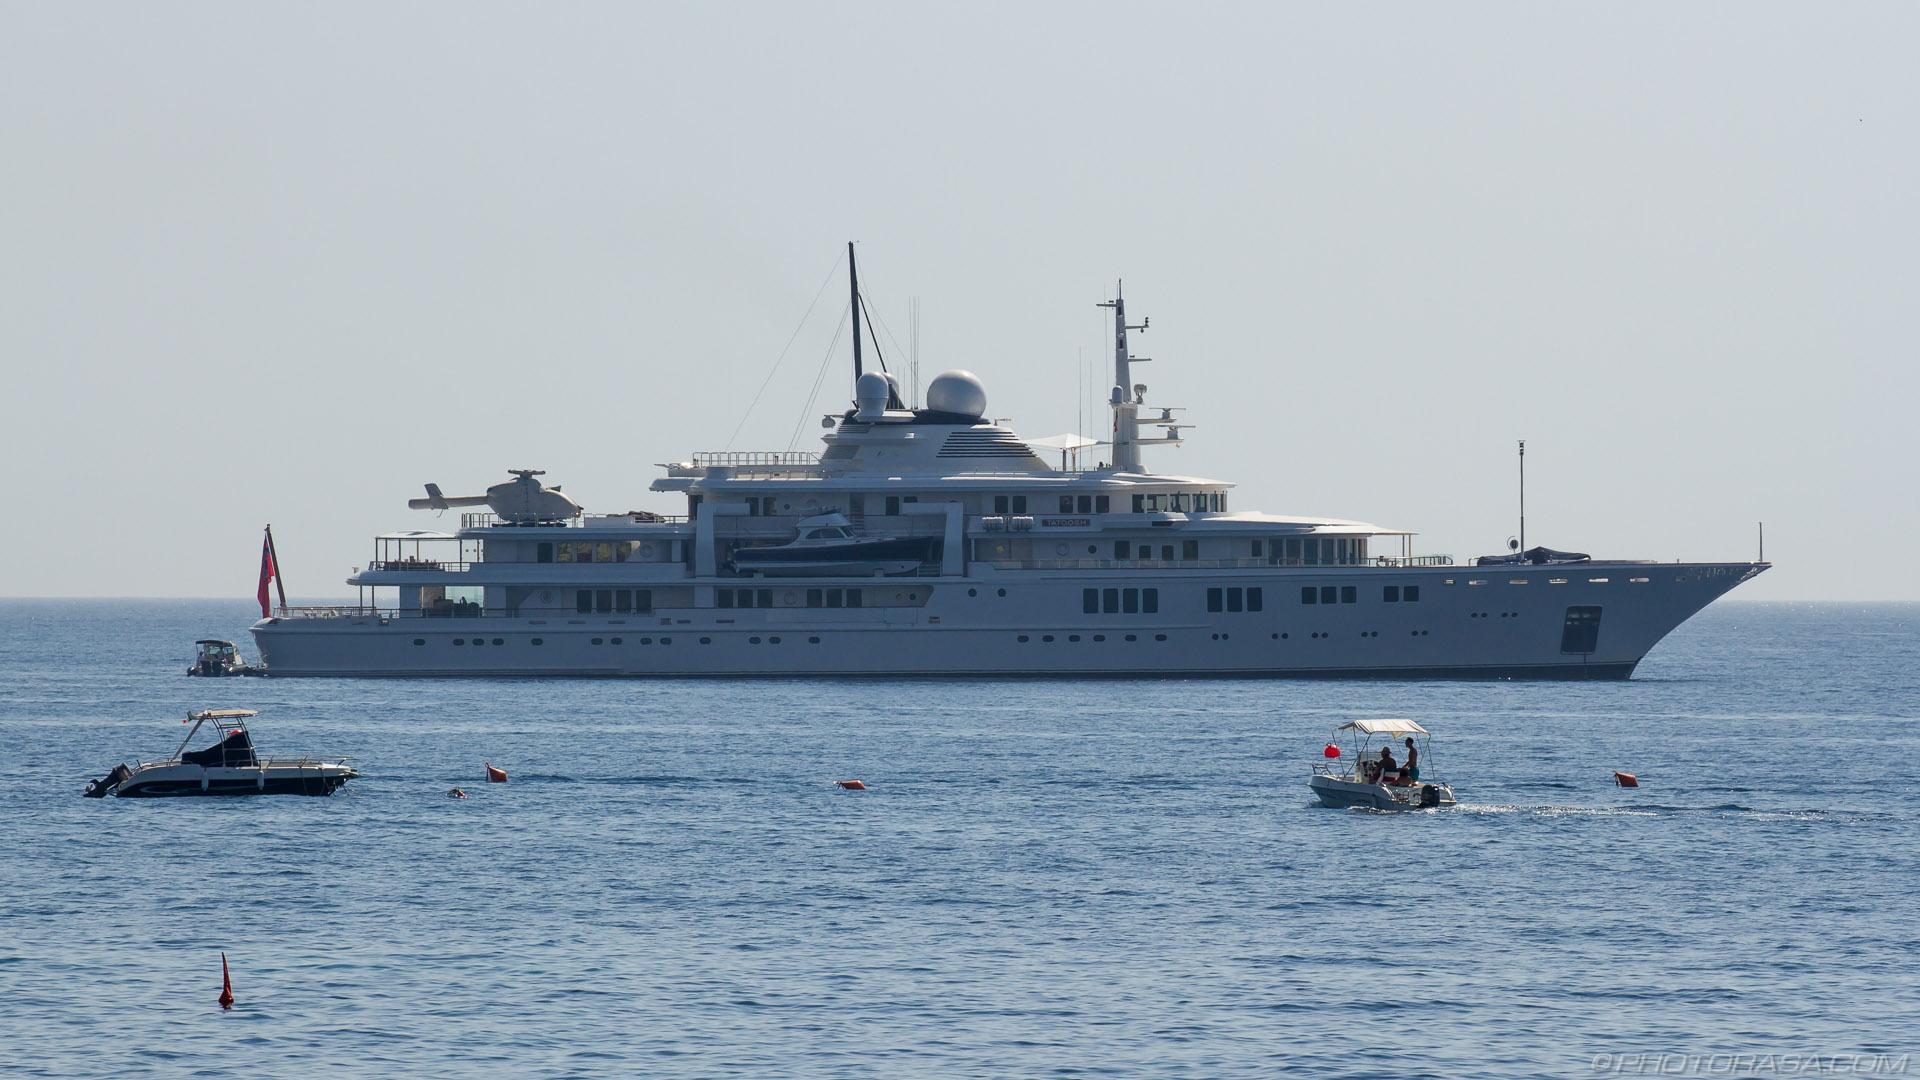 https://photorasa.com/giardini-naxos/tatoosh-super-yacht/